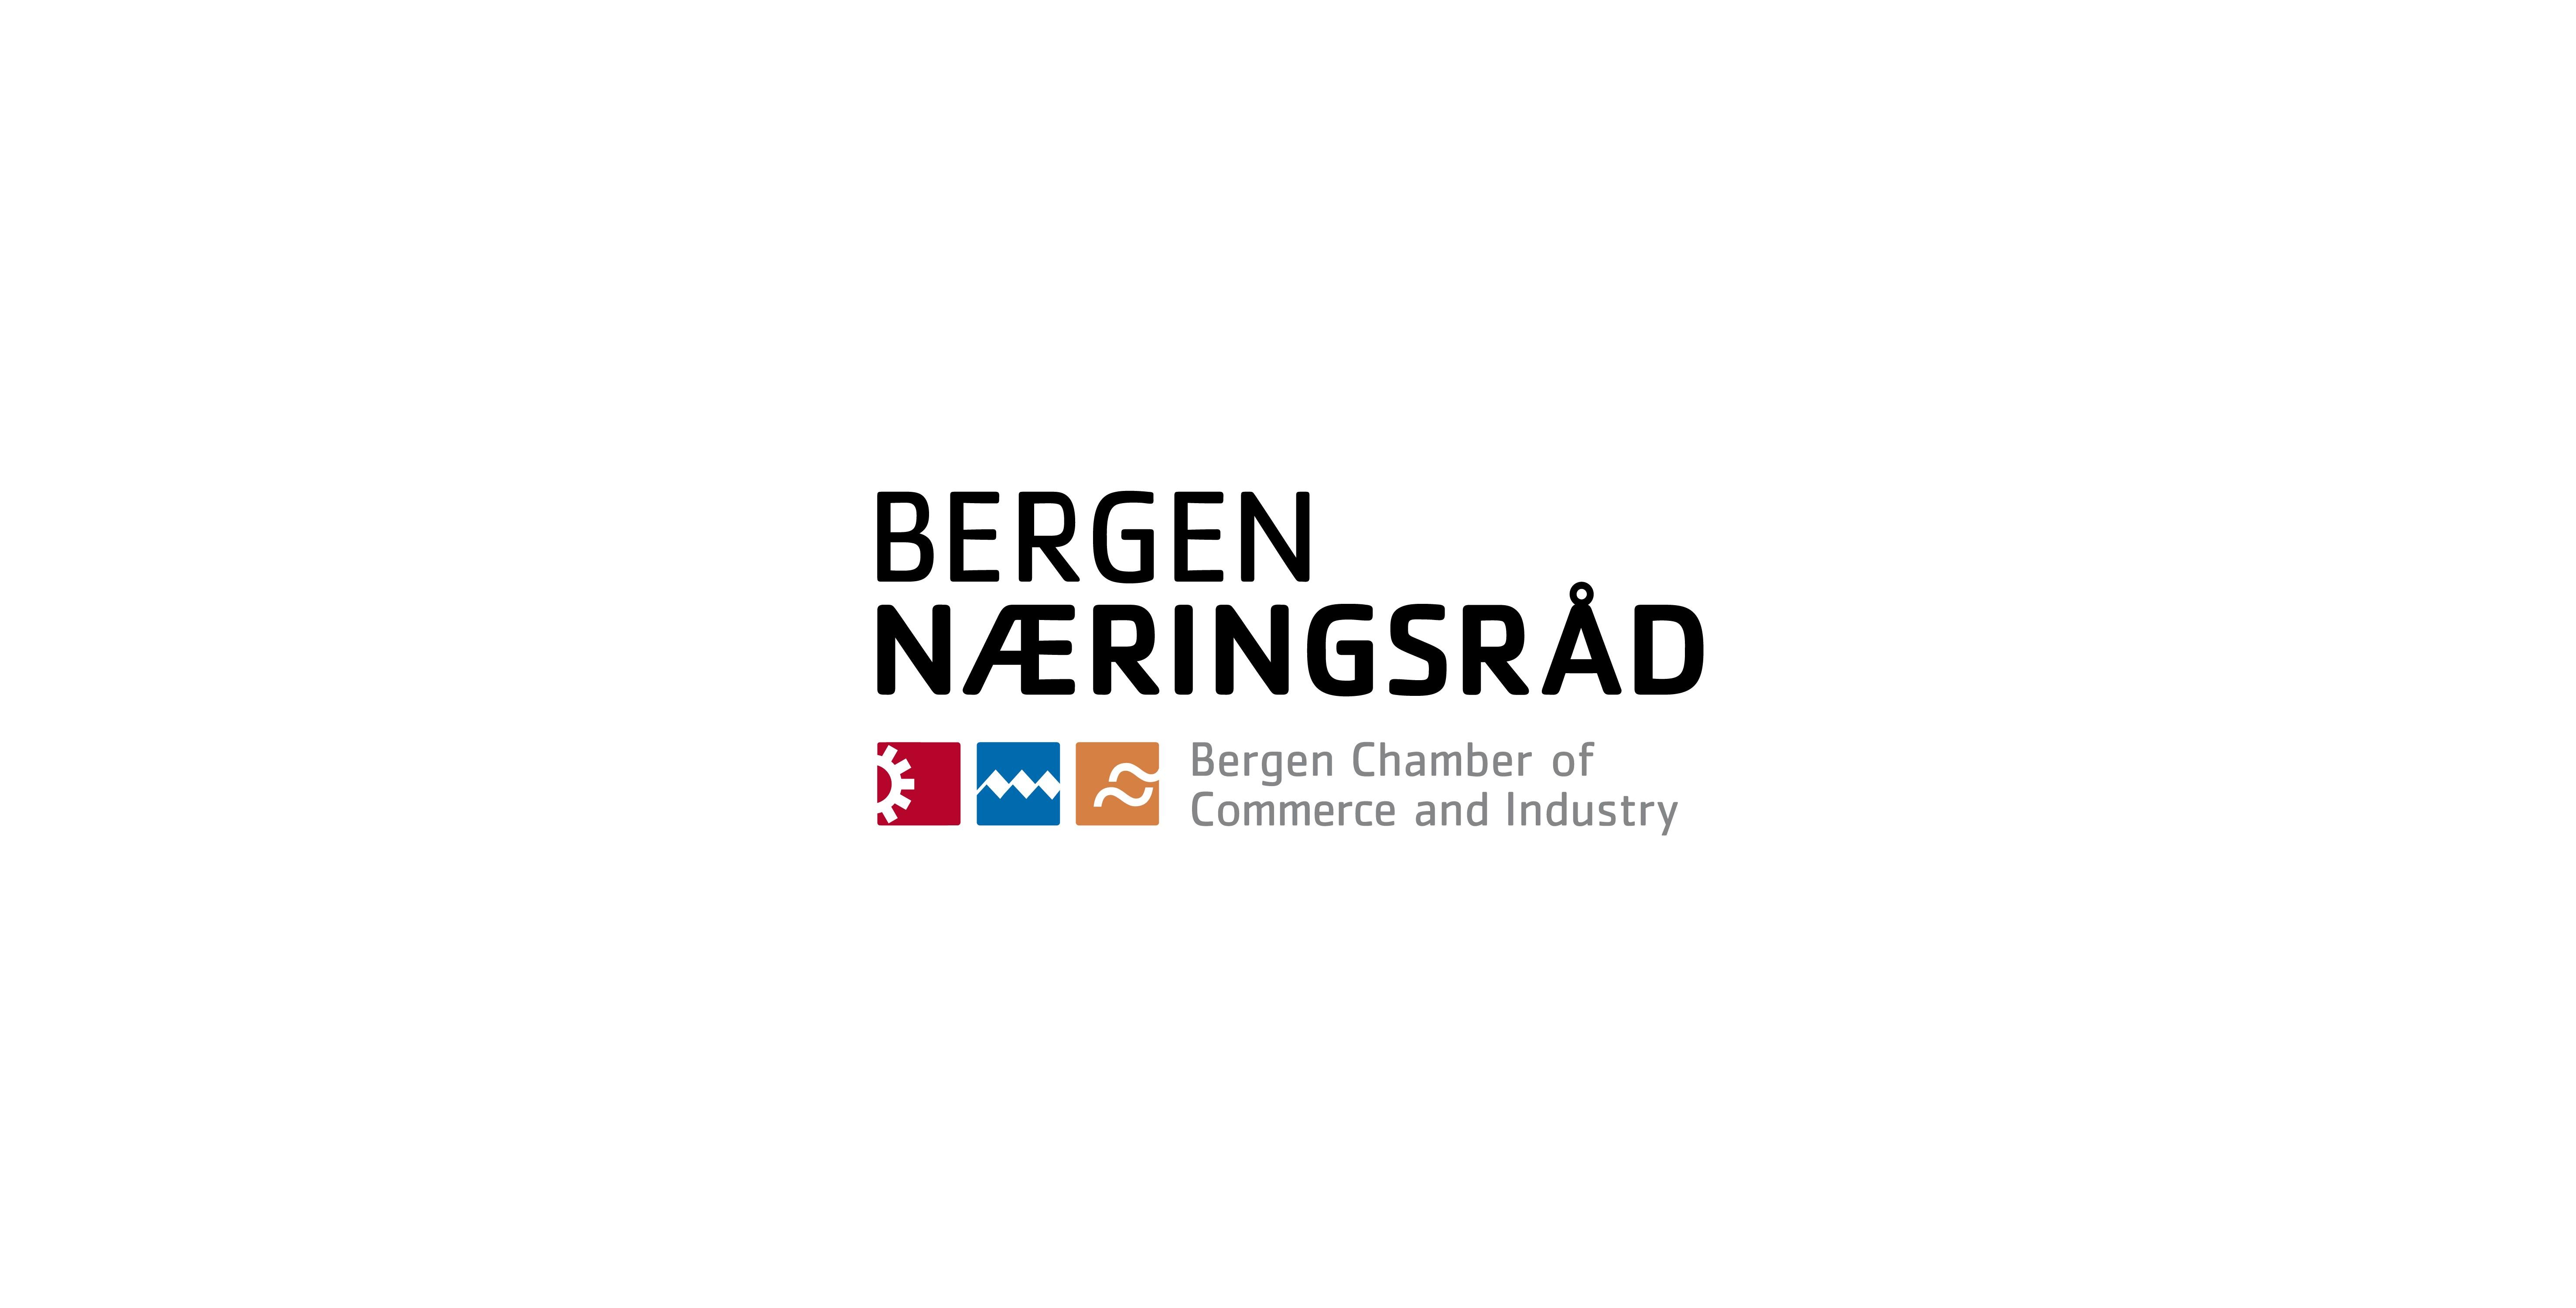 Bergen Næringsråd Linkedin